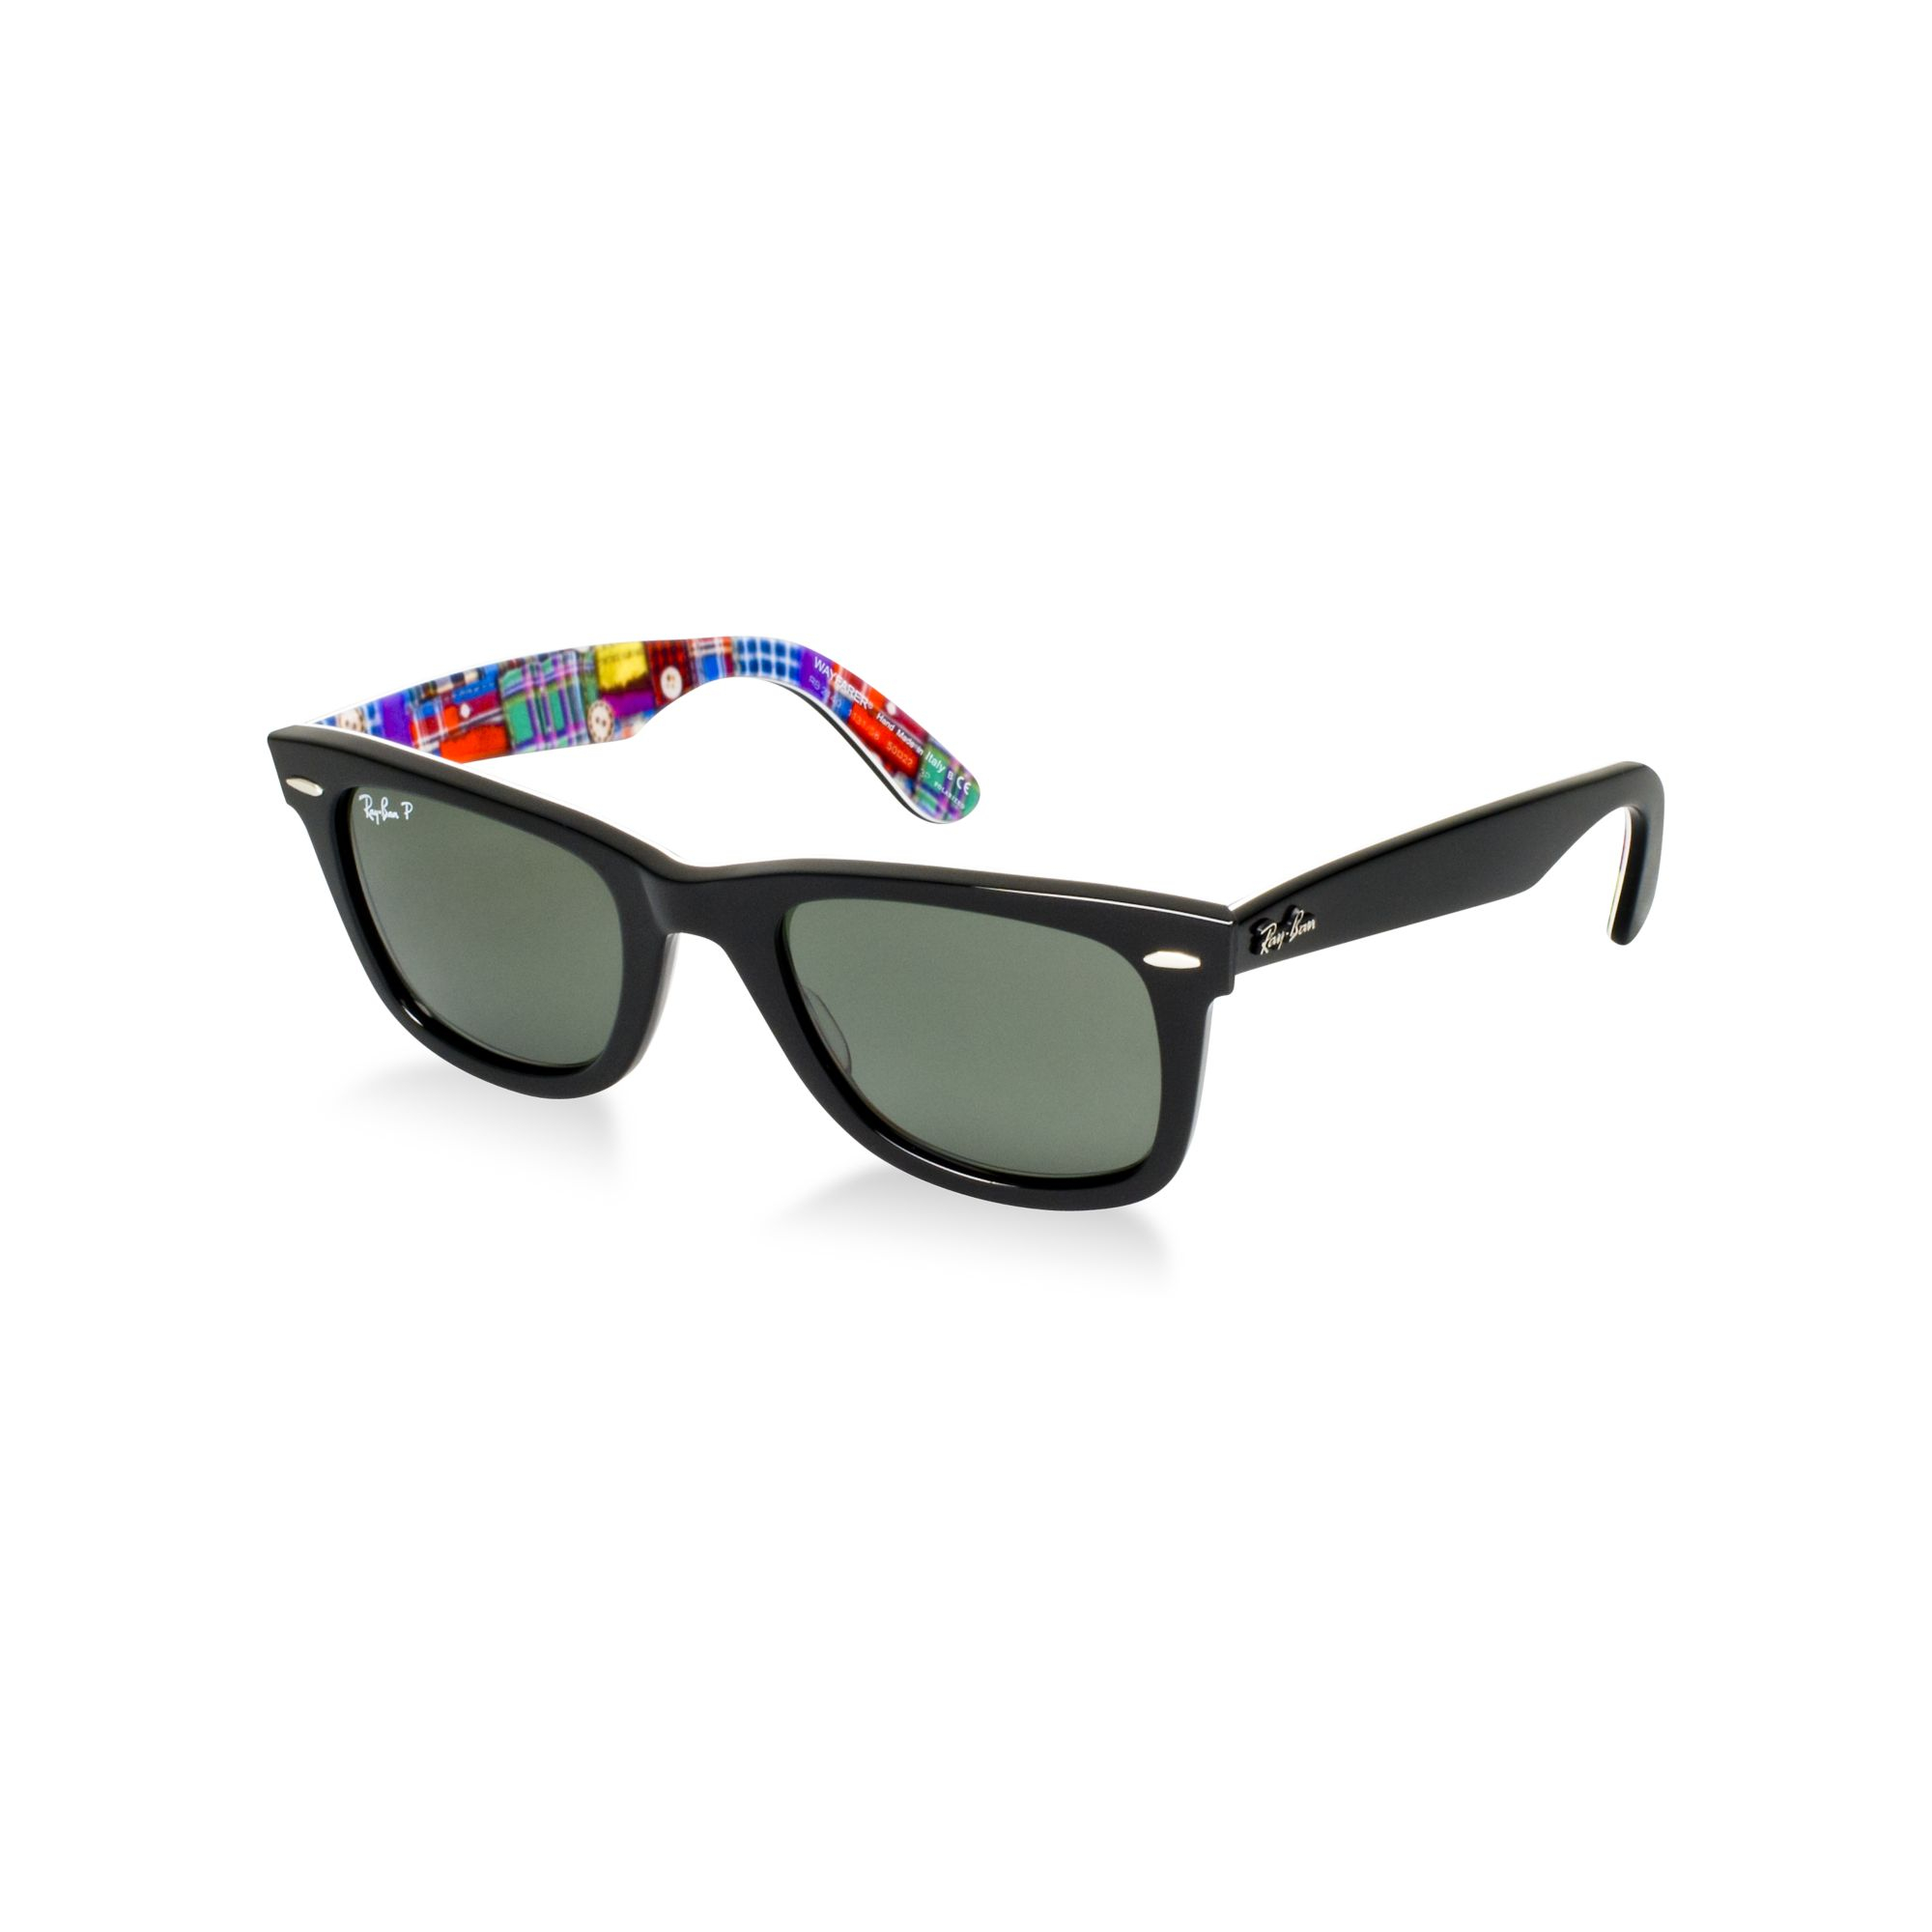 bd5941ae81 Macys Ray Ban Clubmaster Sunglasses « Heritage Malta